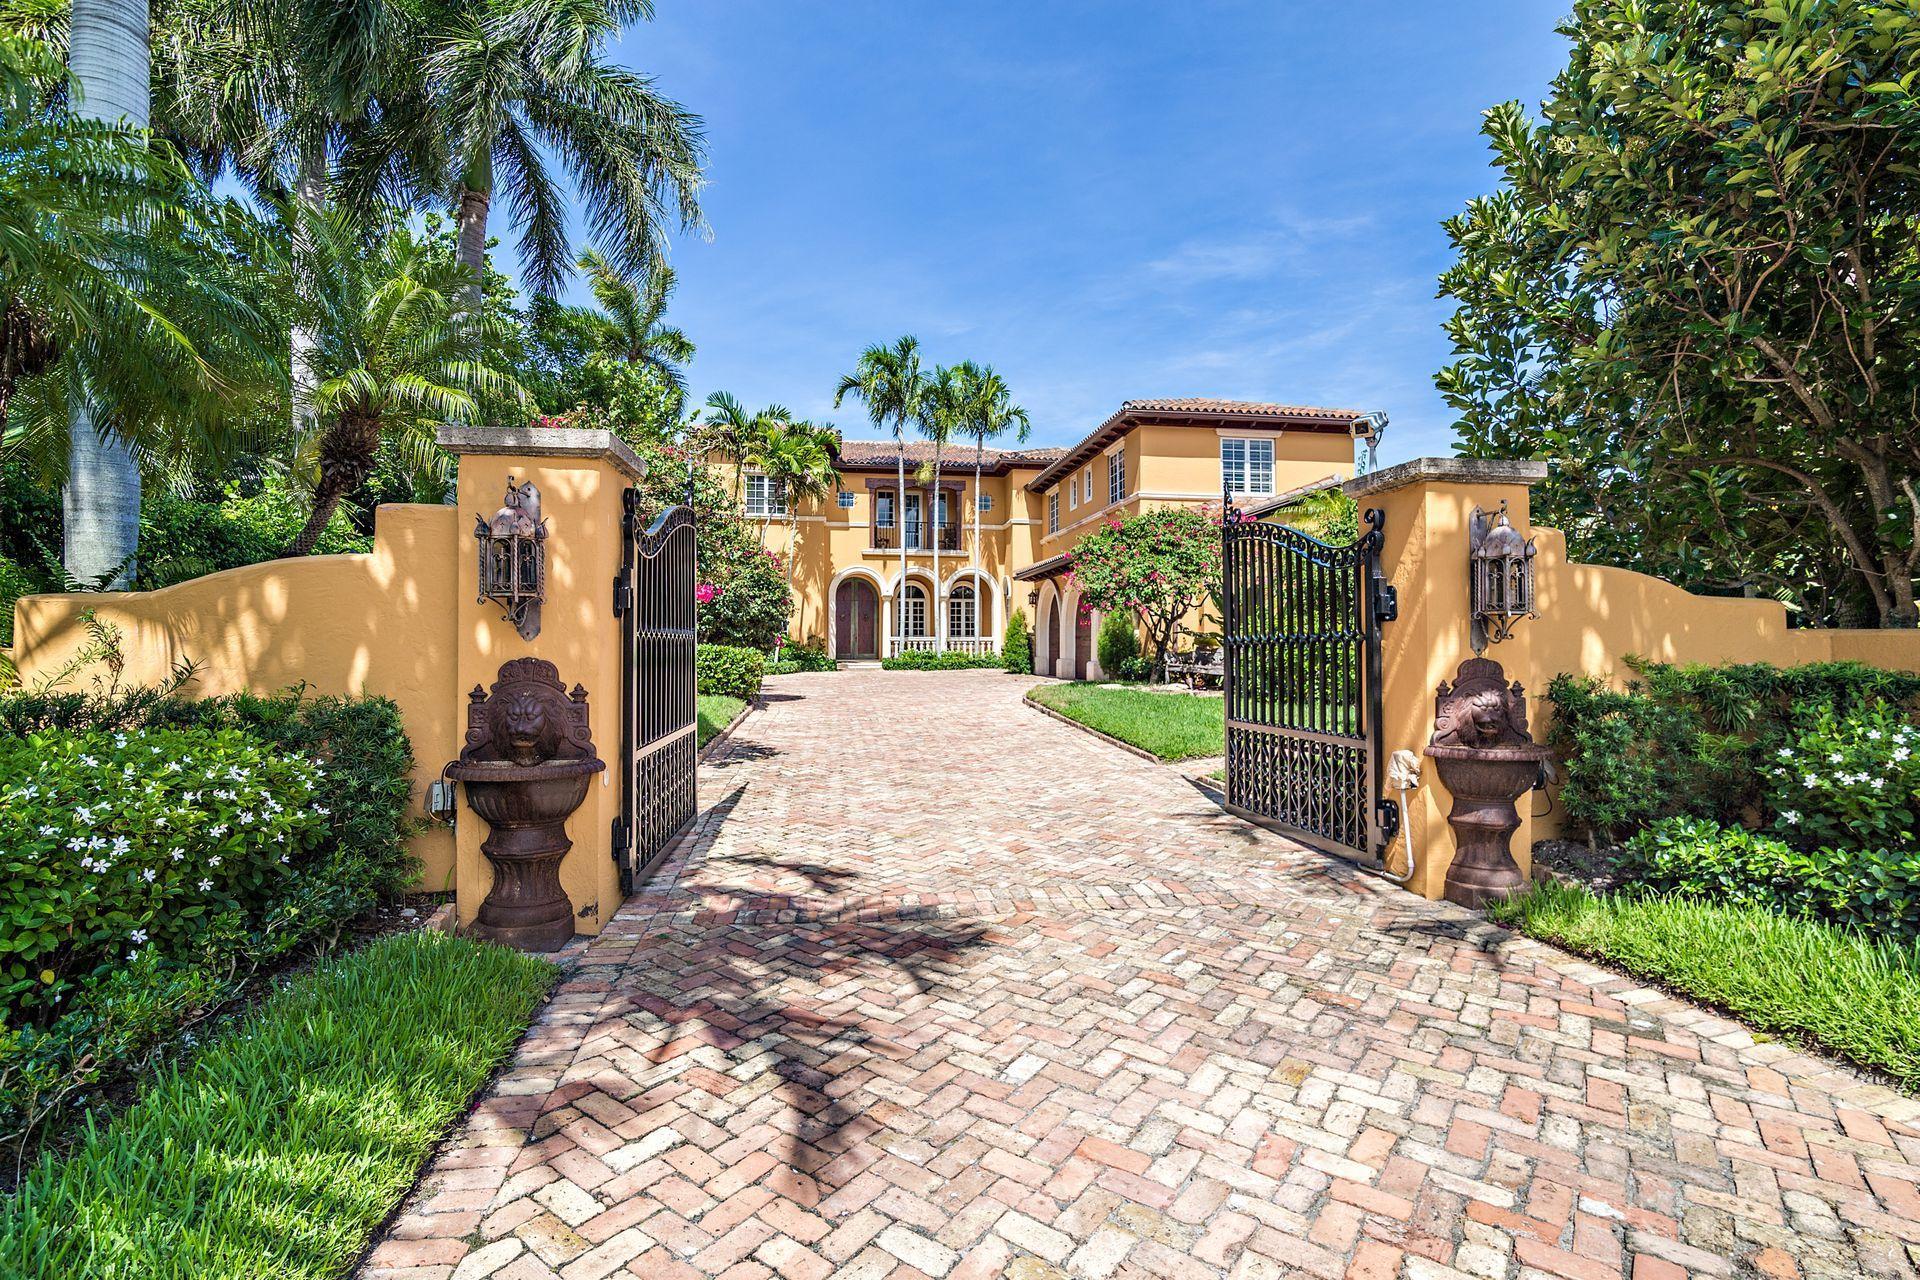 Photo of 3180 Washington Road, West Palm Beach, FL 33405